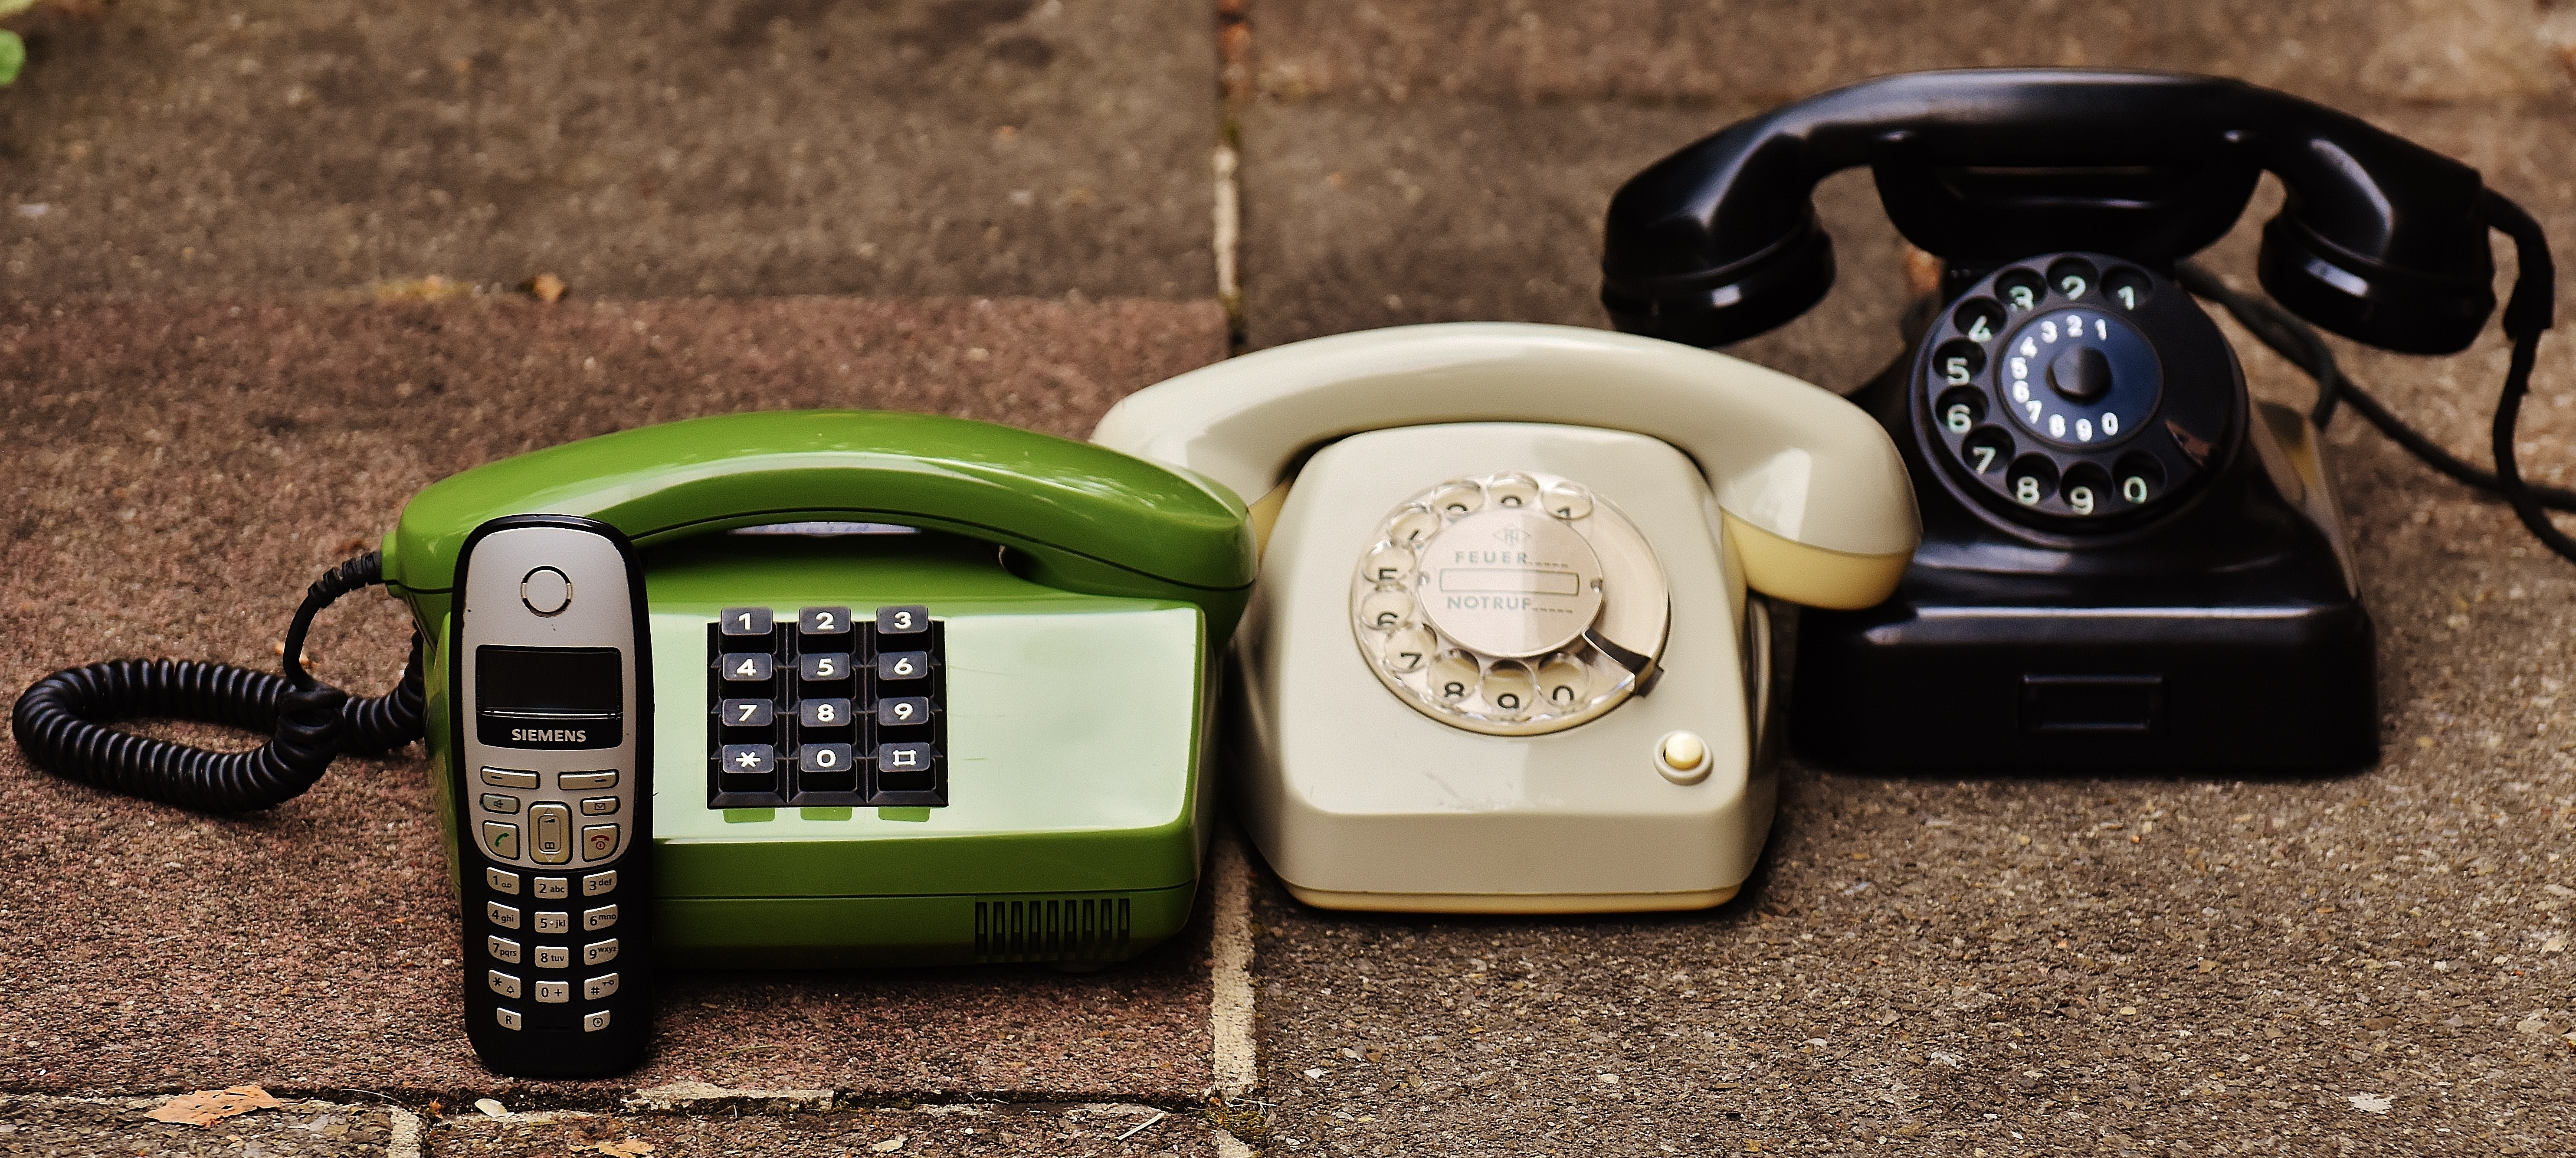 telephone, contact